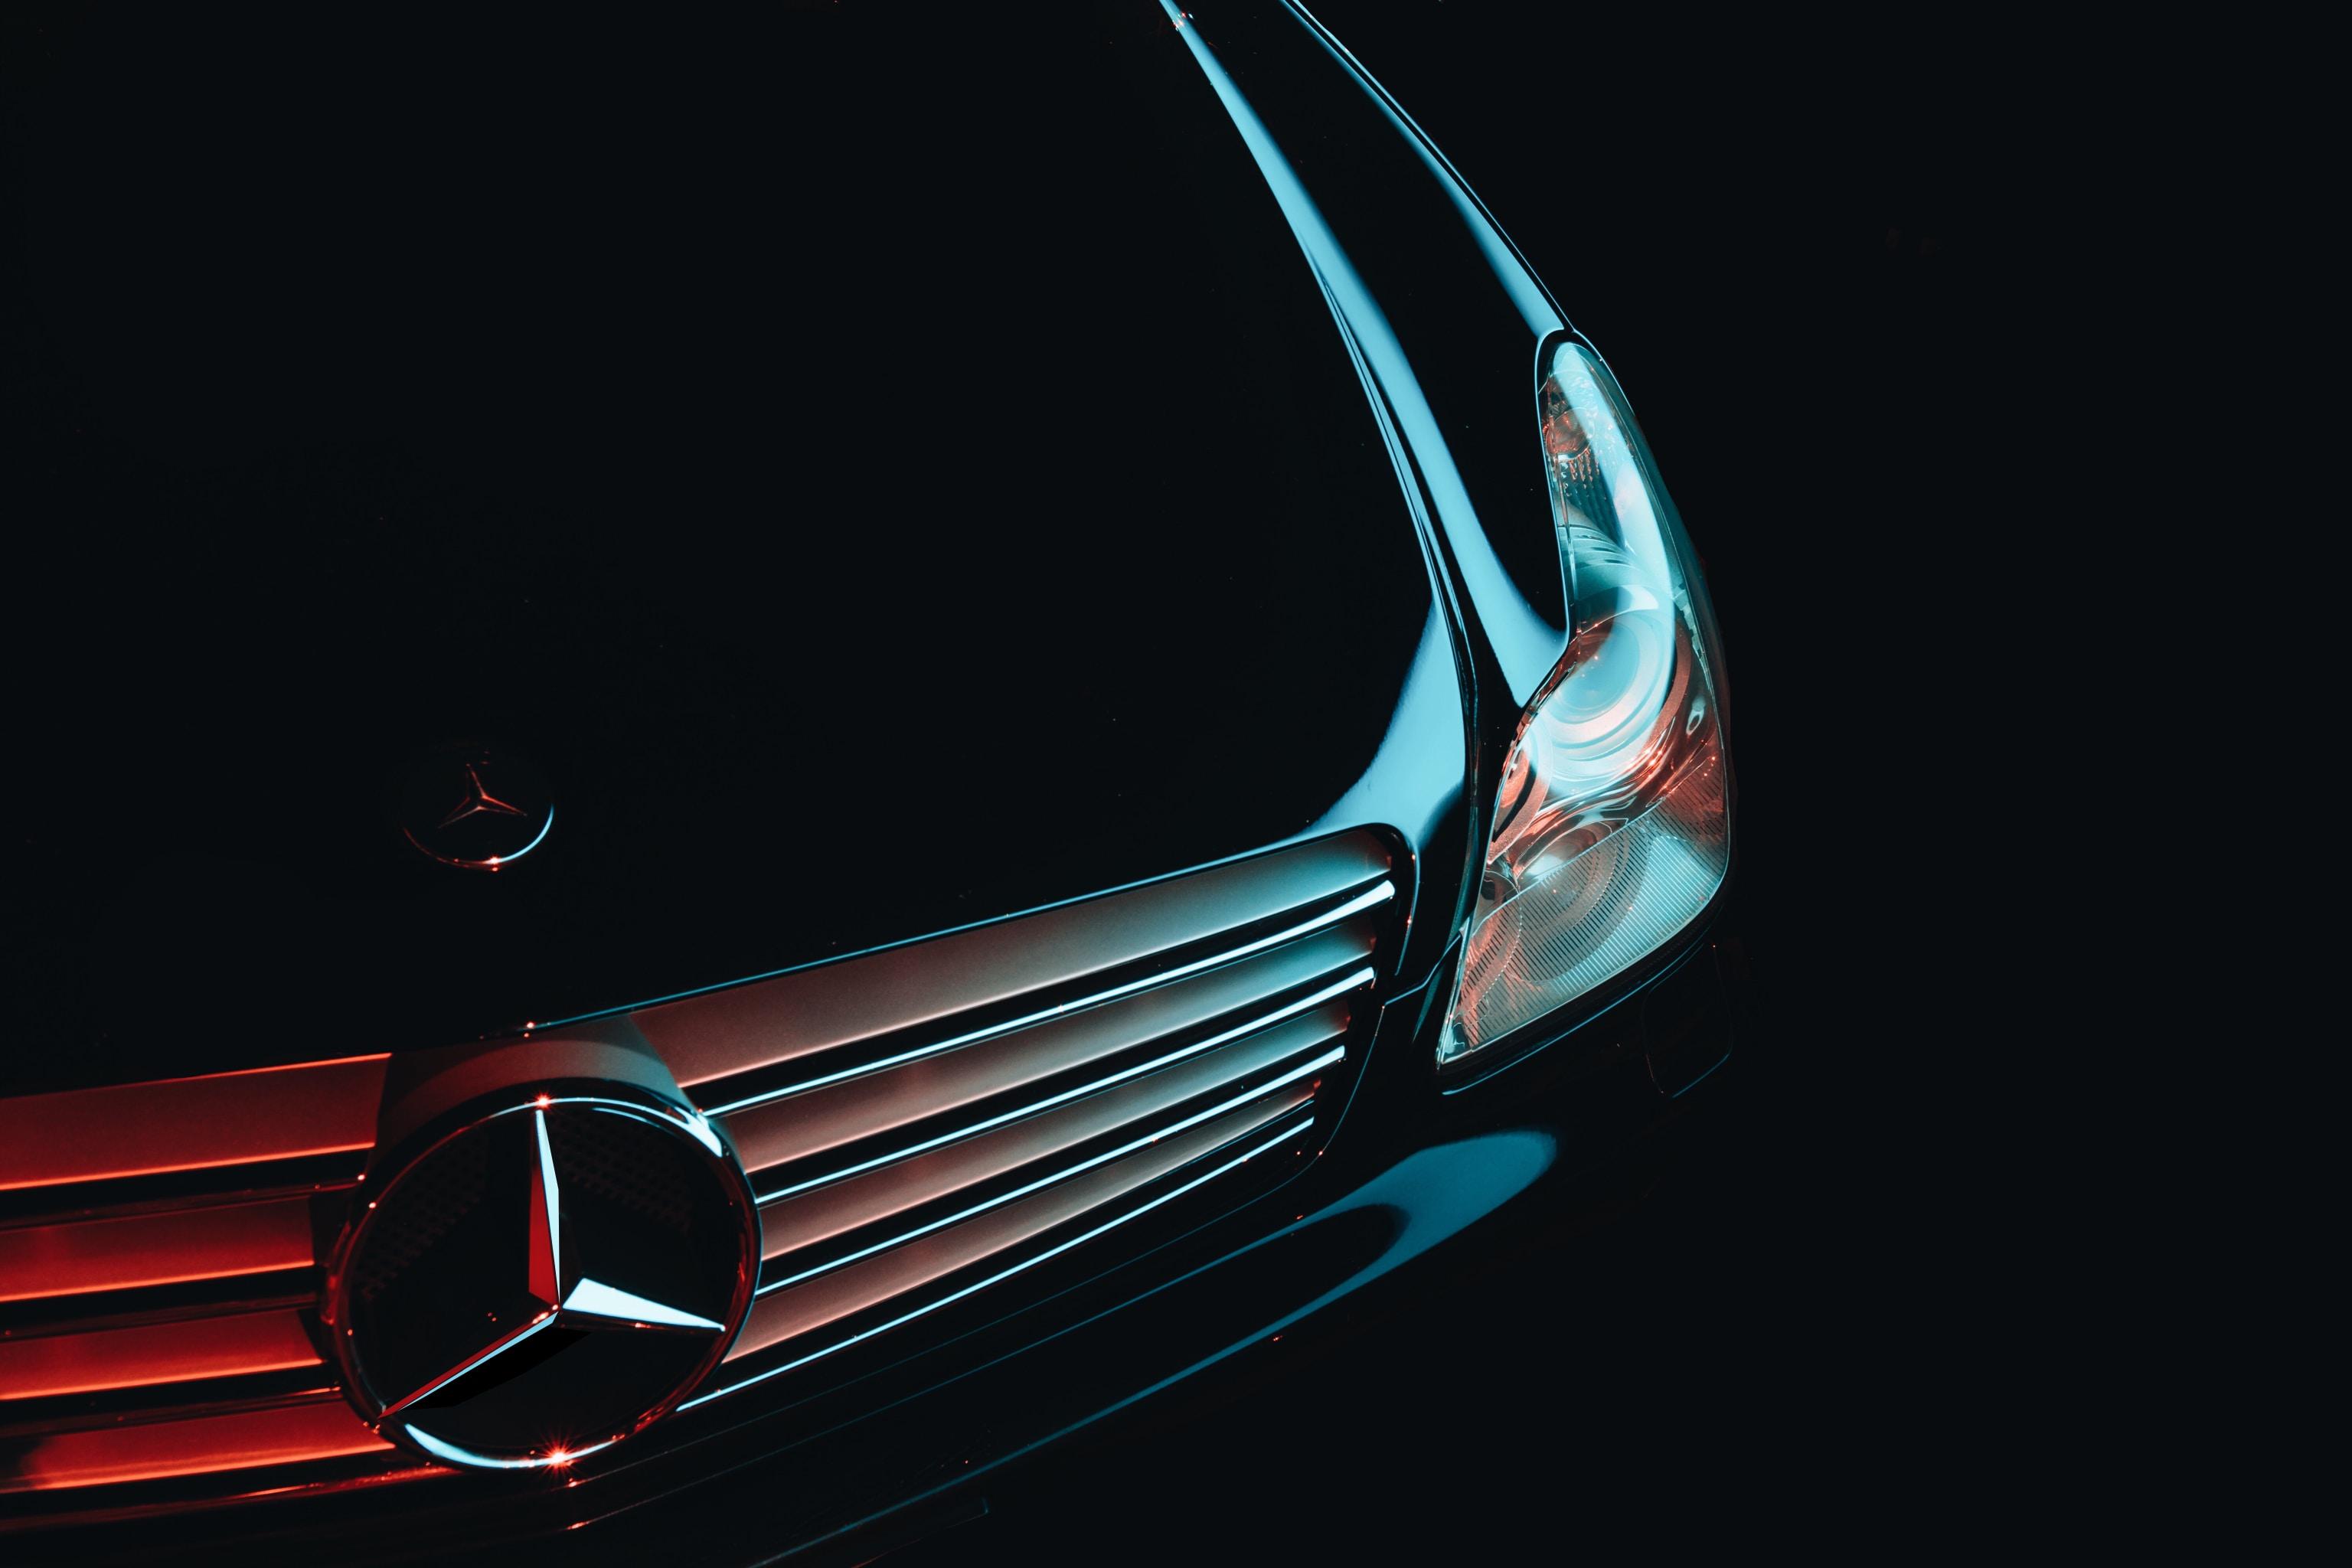 Hood ornament and front bumper details on a black Mercedes Benz